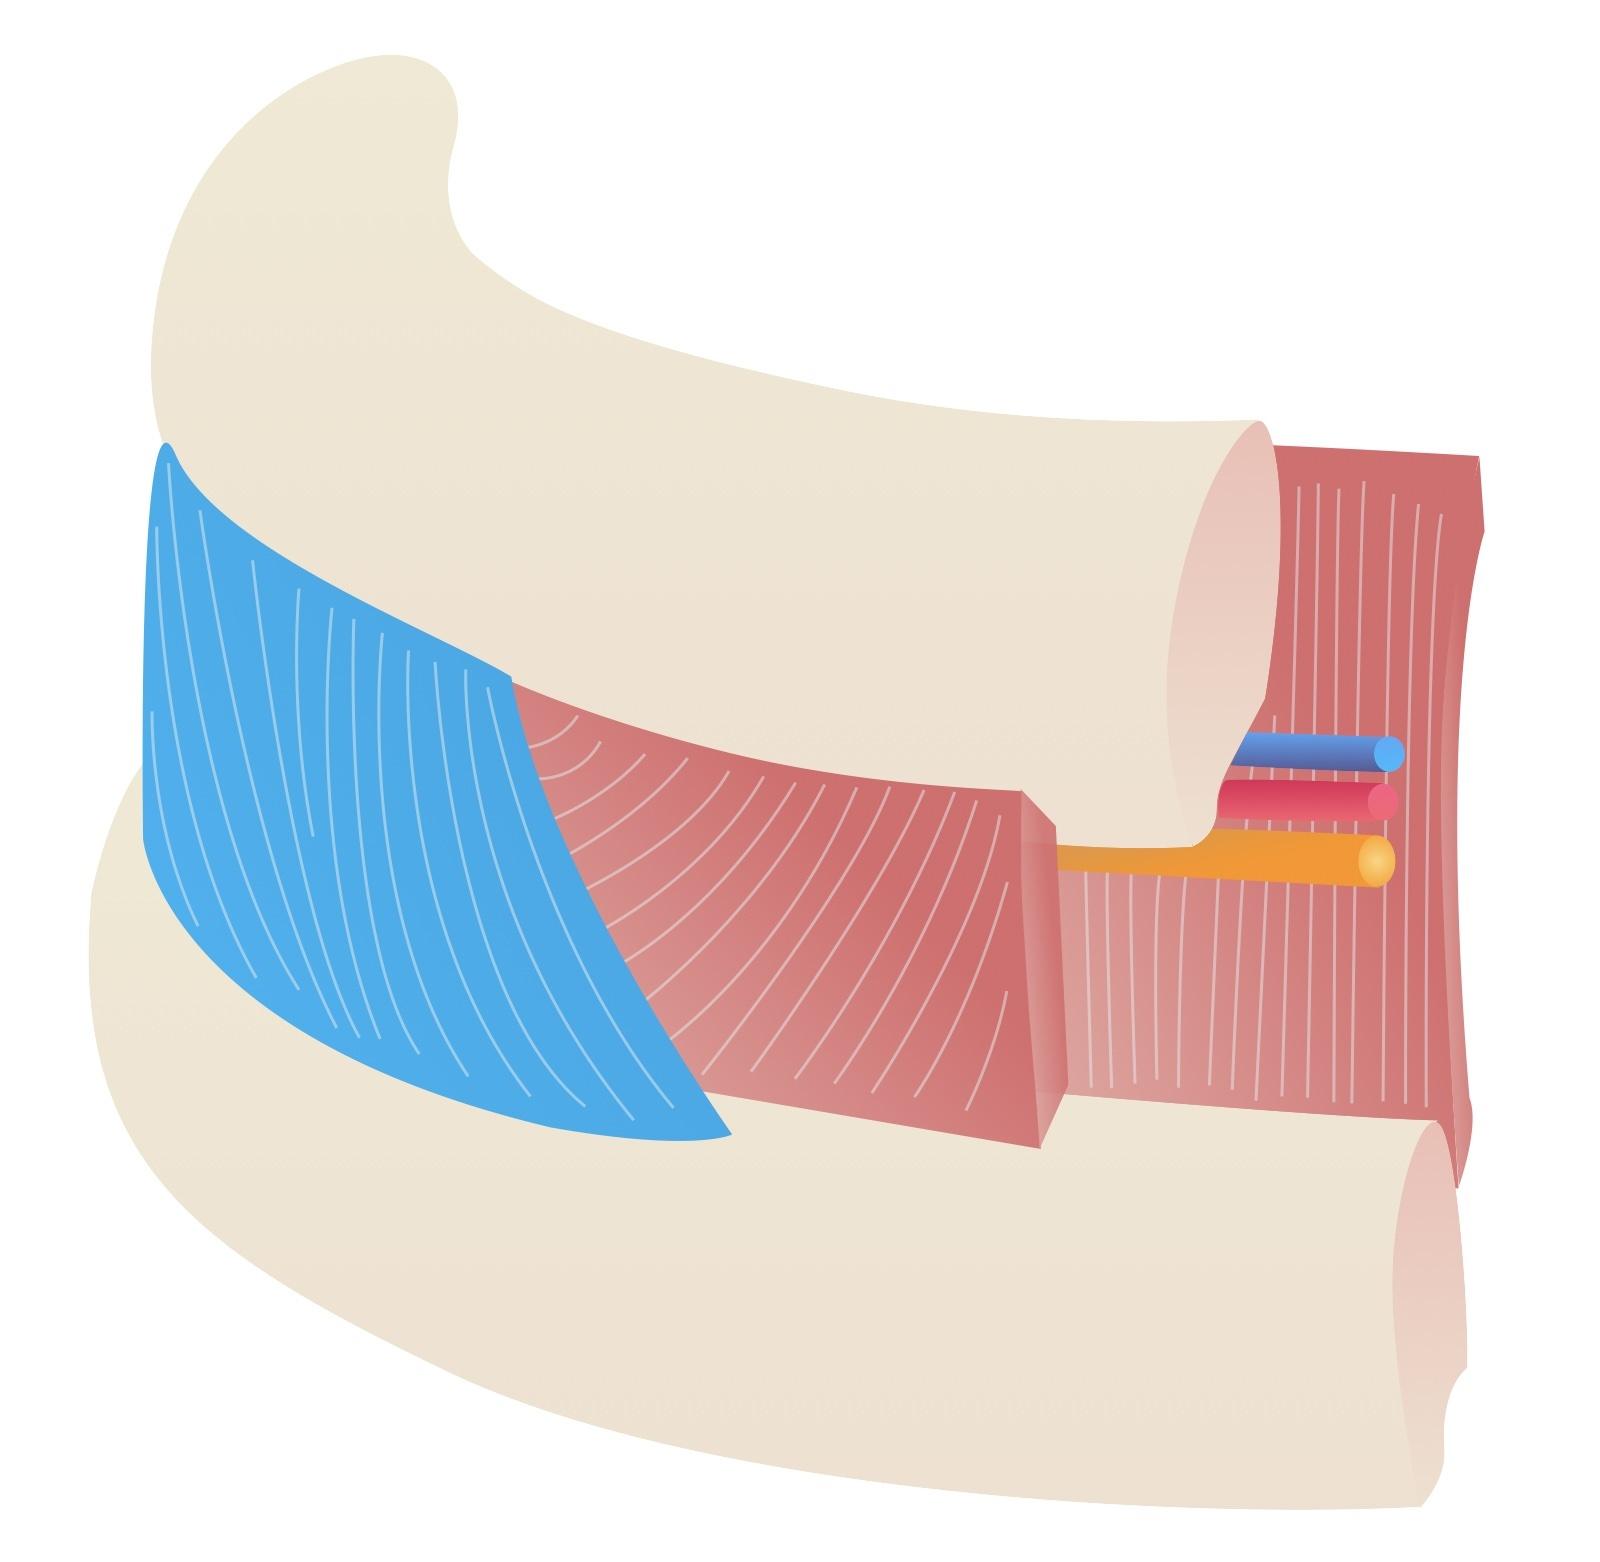 External intercostal muscle anatomy